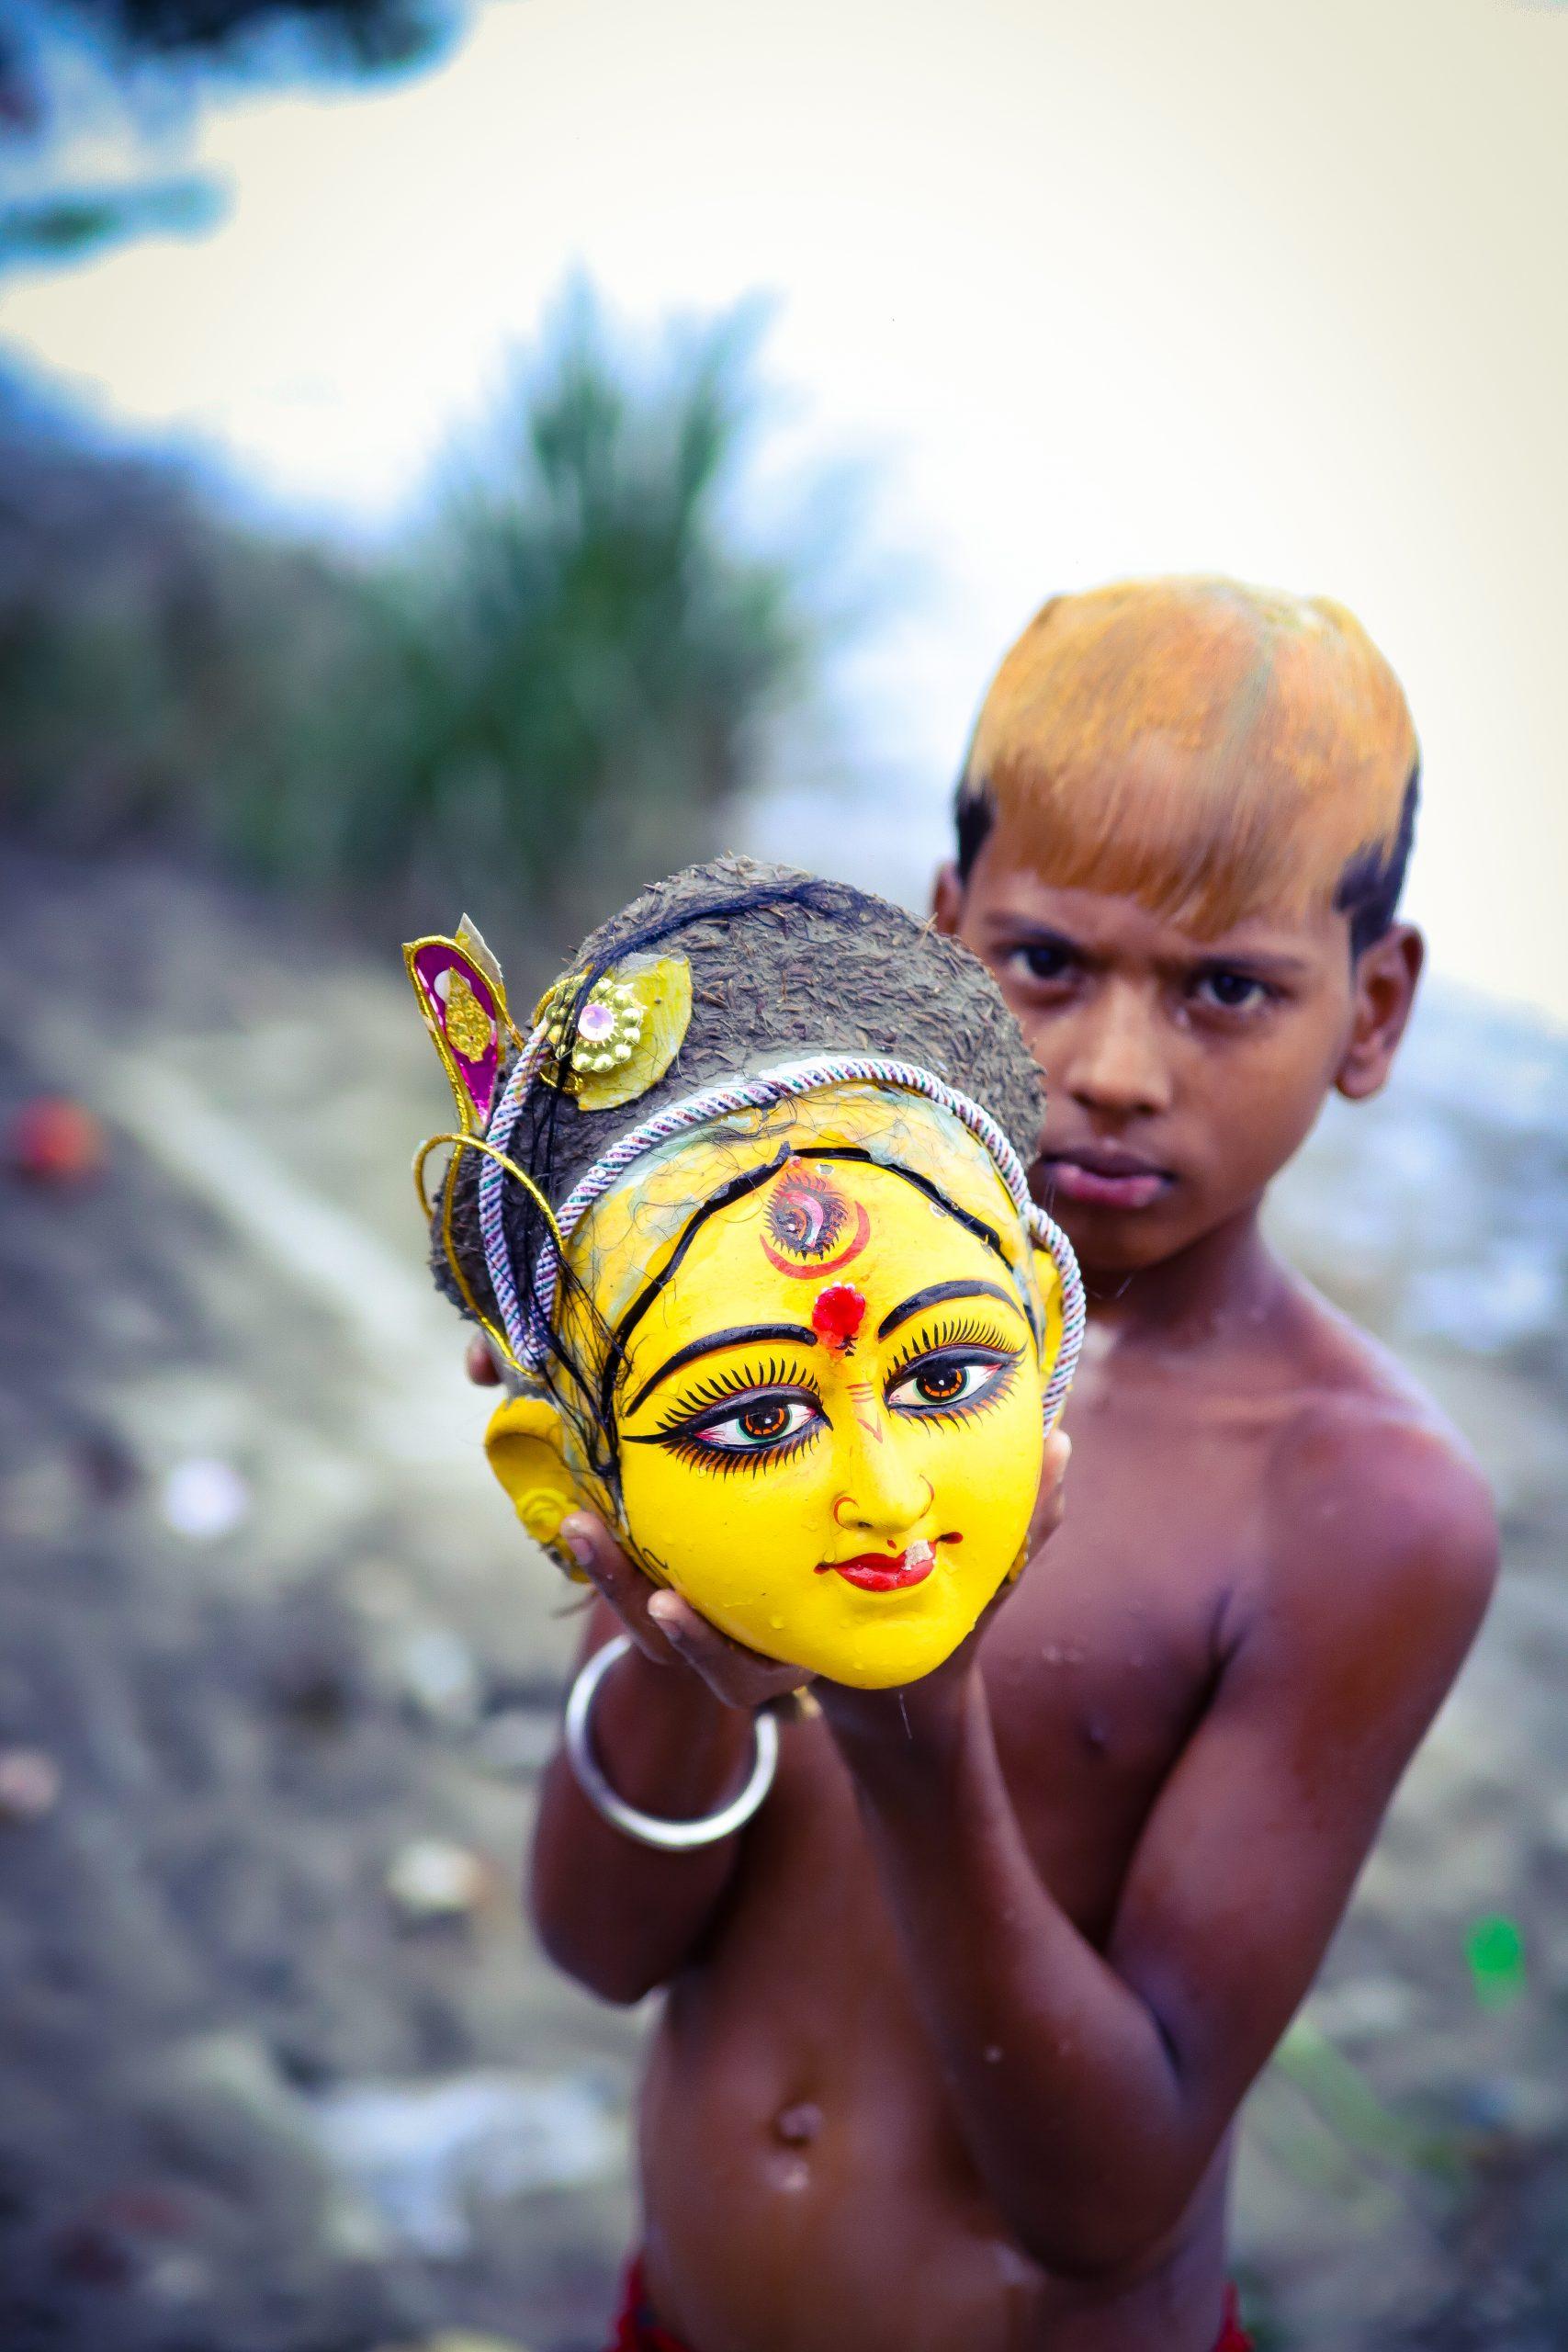 Boy holding Durga idol during Durga Puja festival in Kolkata